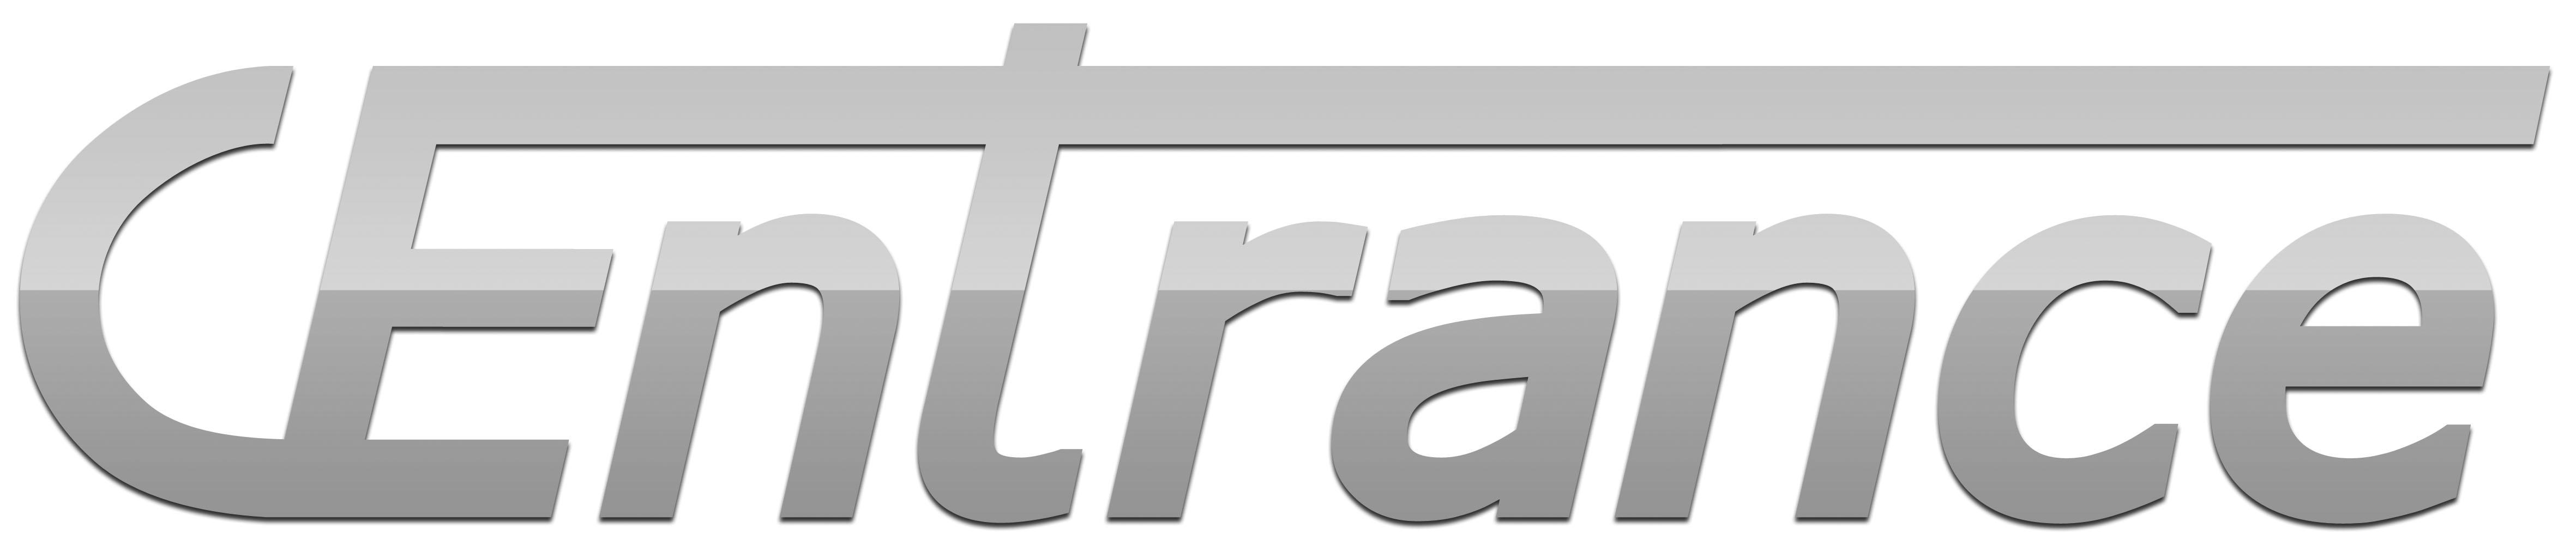 CEntrance logo